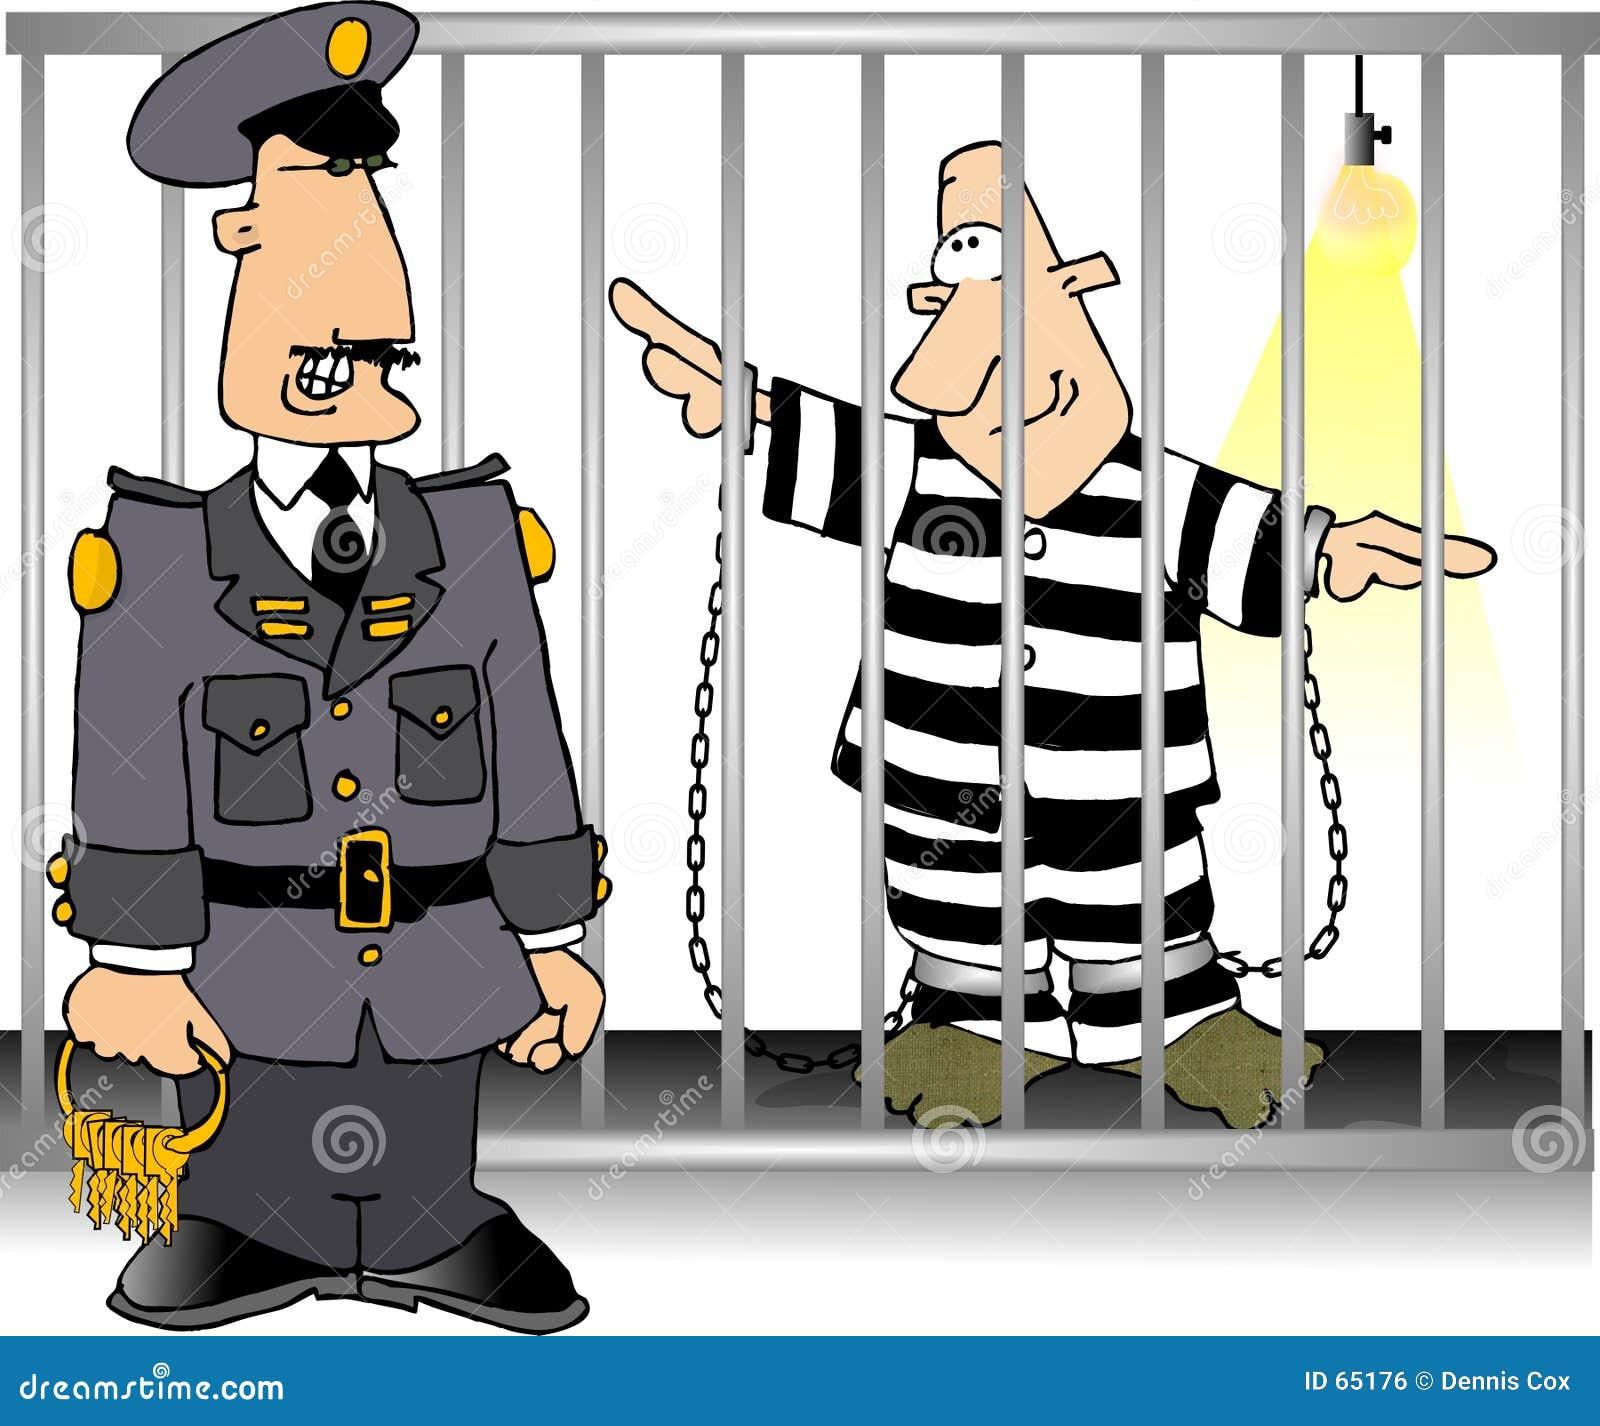 Image result for jailbird